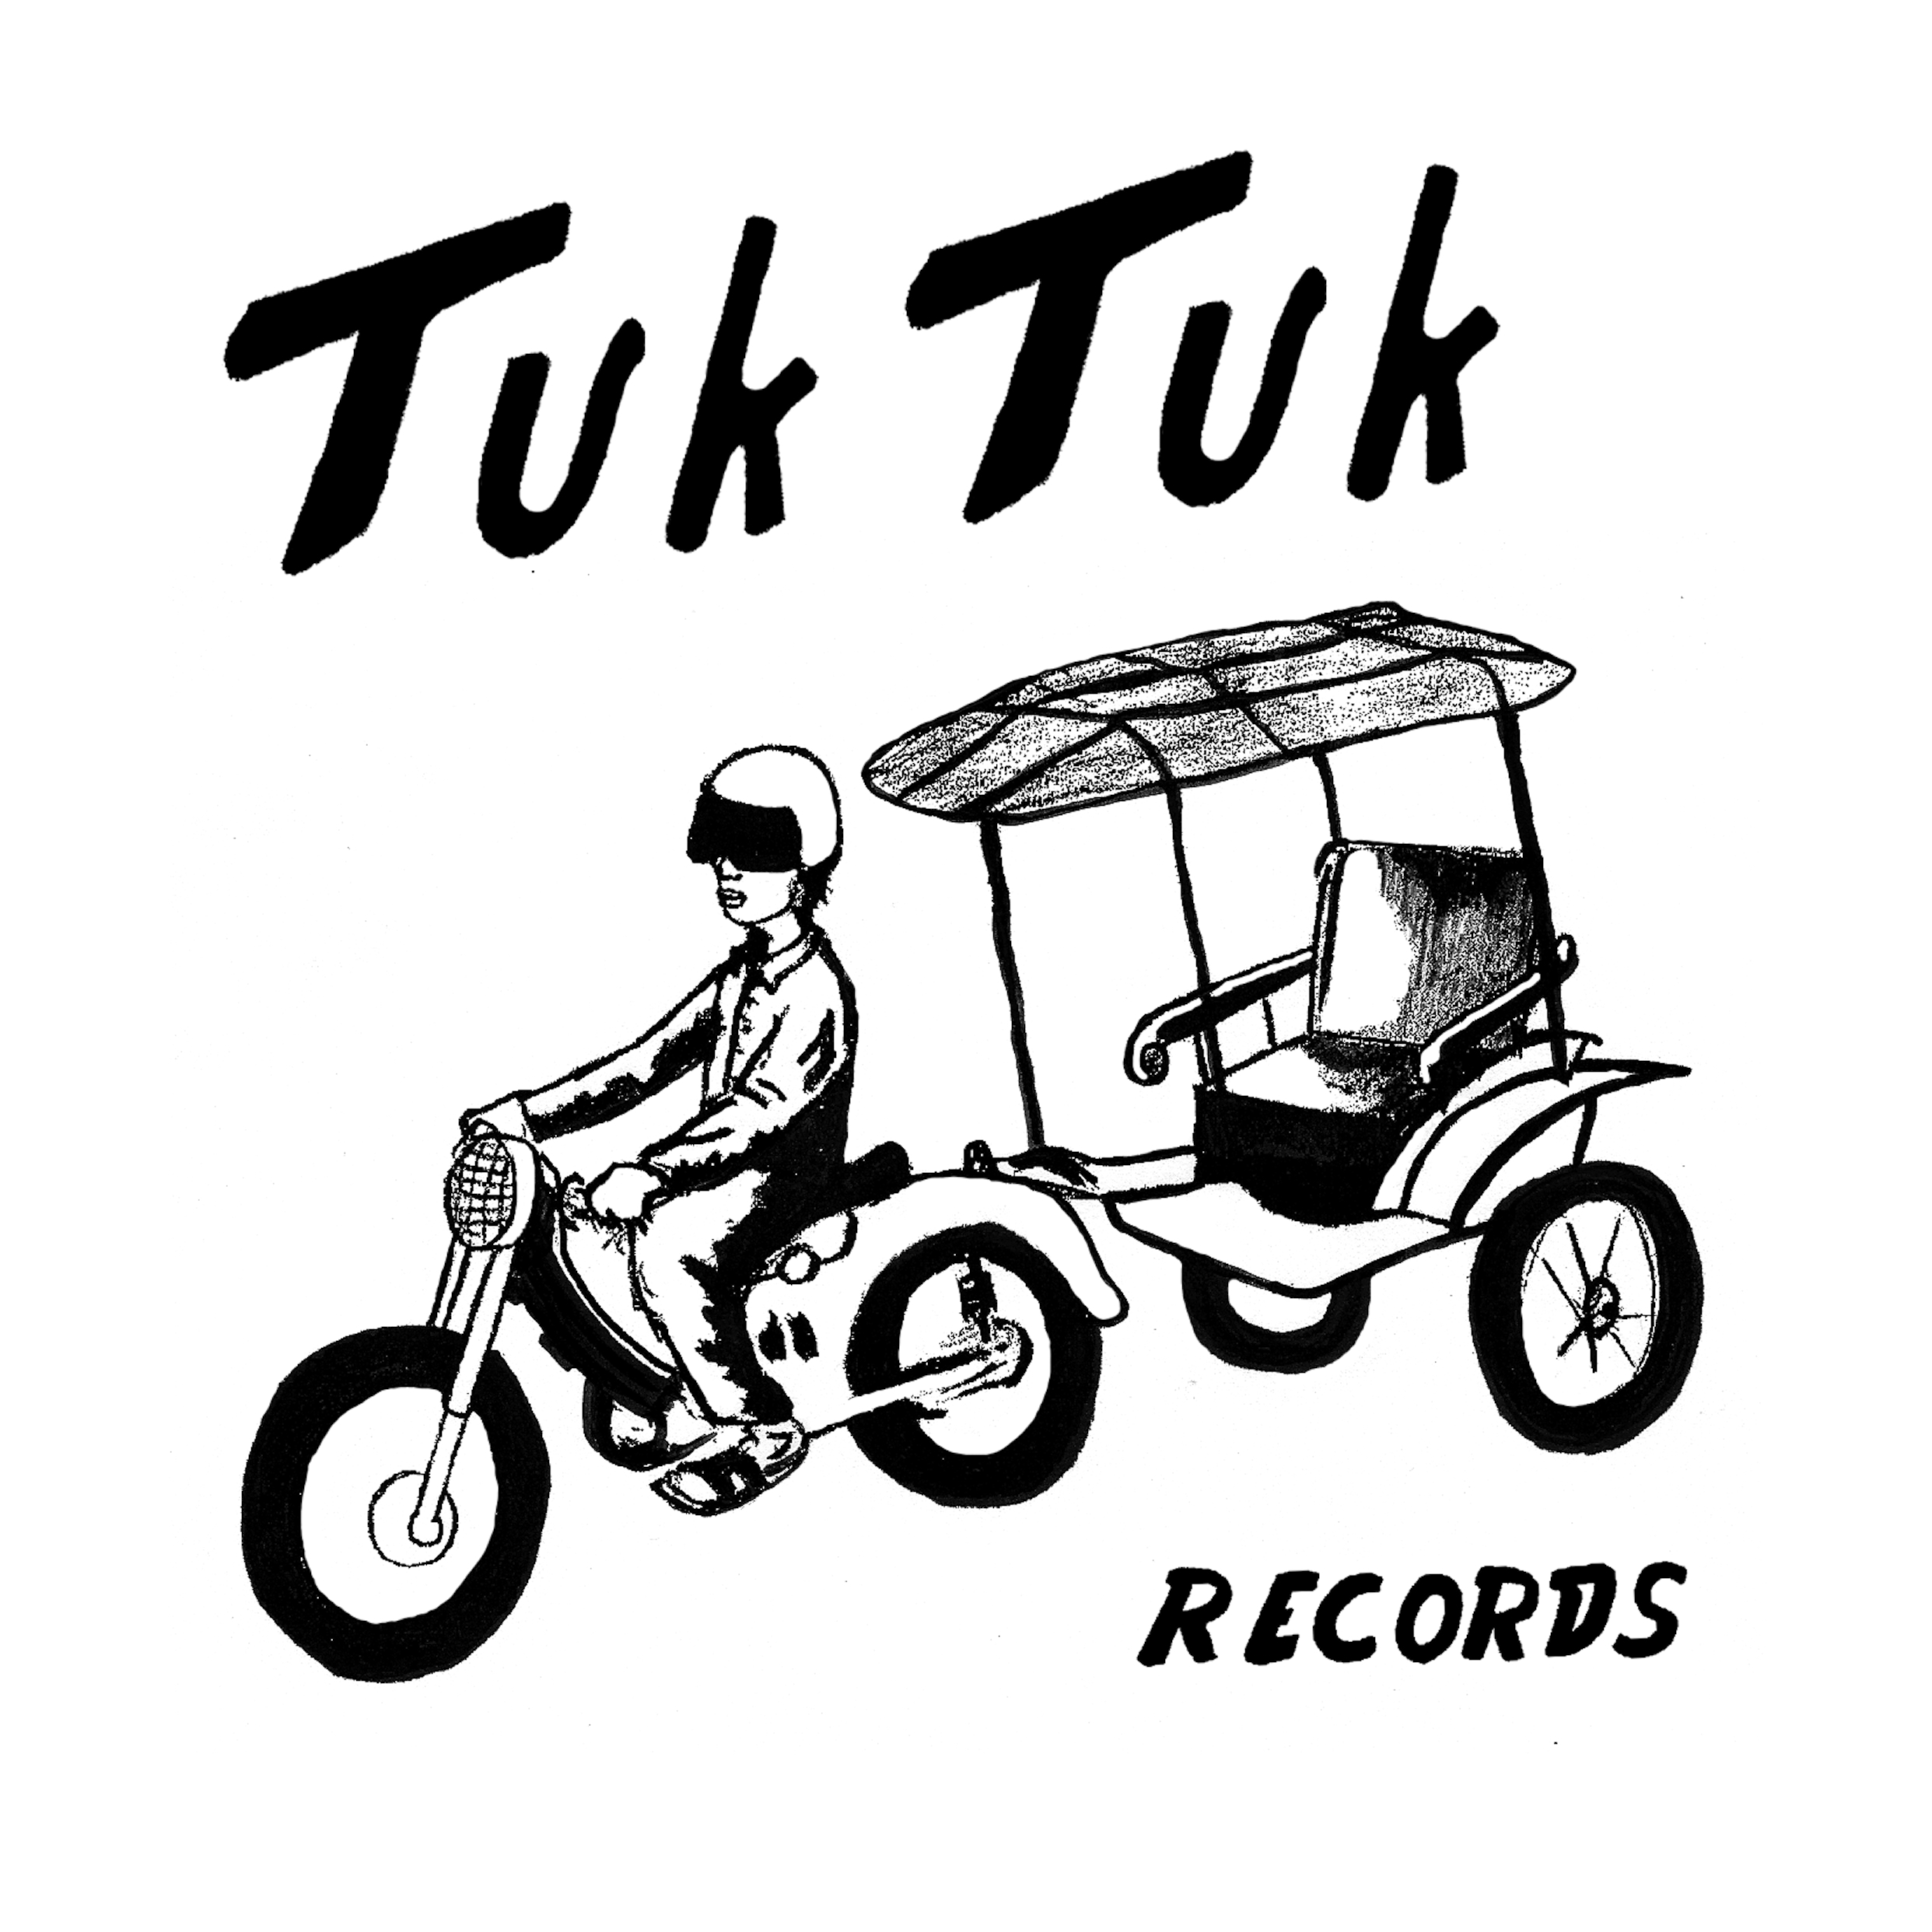 2484x2484 Dengue Fever Launches New Record Label Tuk Tuk Records Mvremix Rock